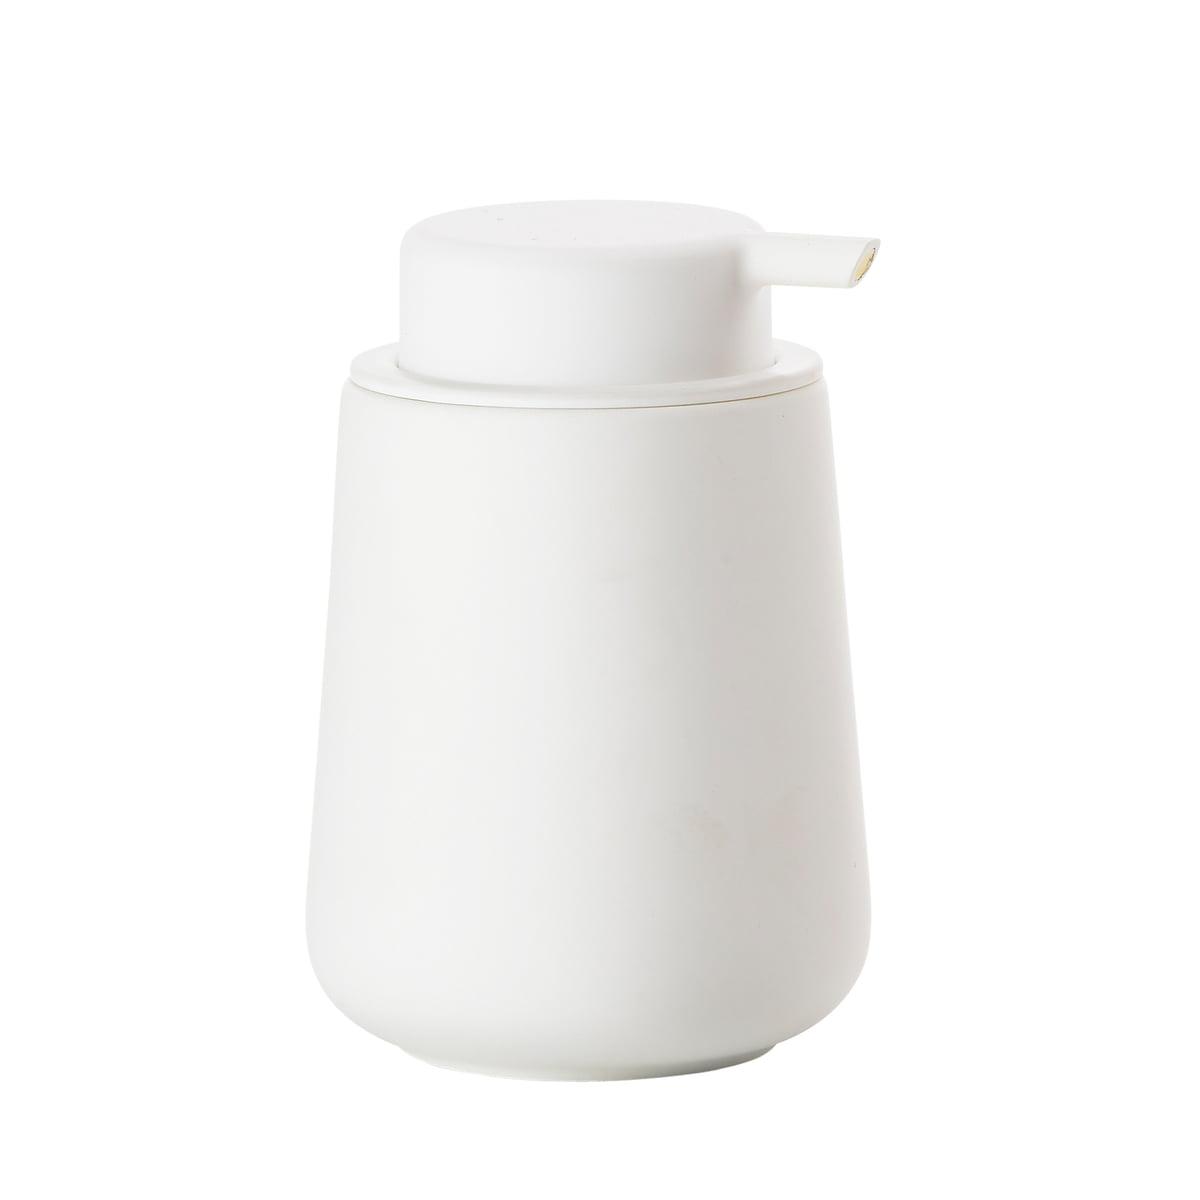 Nova One Soap Dispenser By Zone Denmark In White